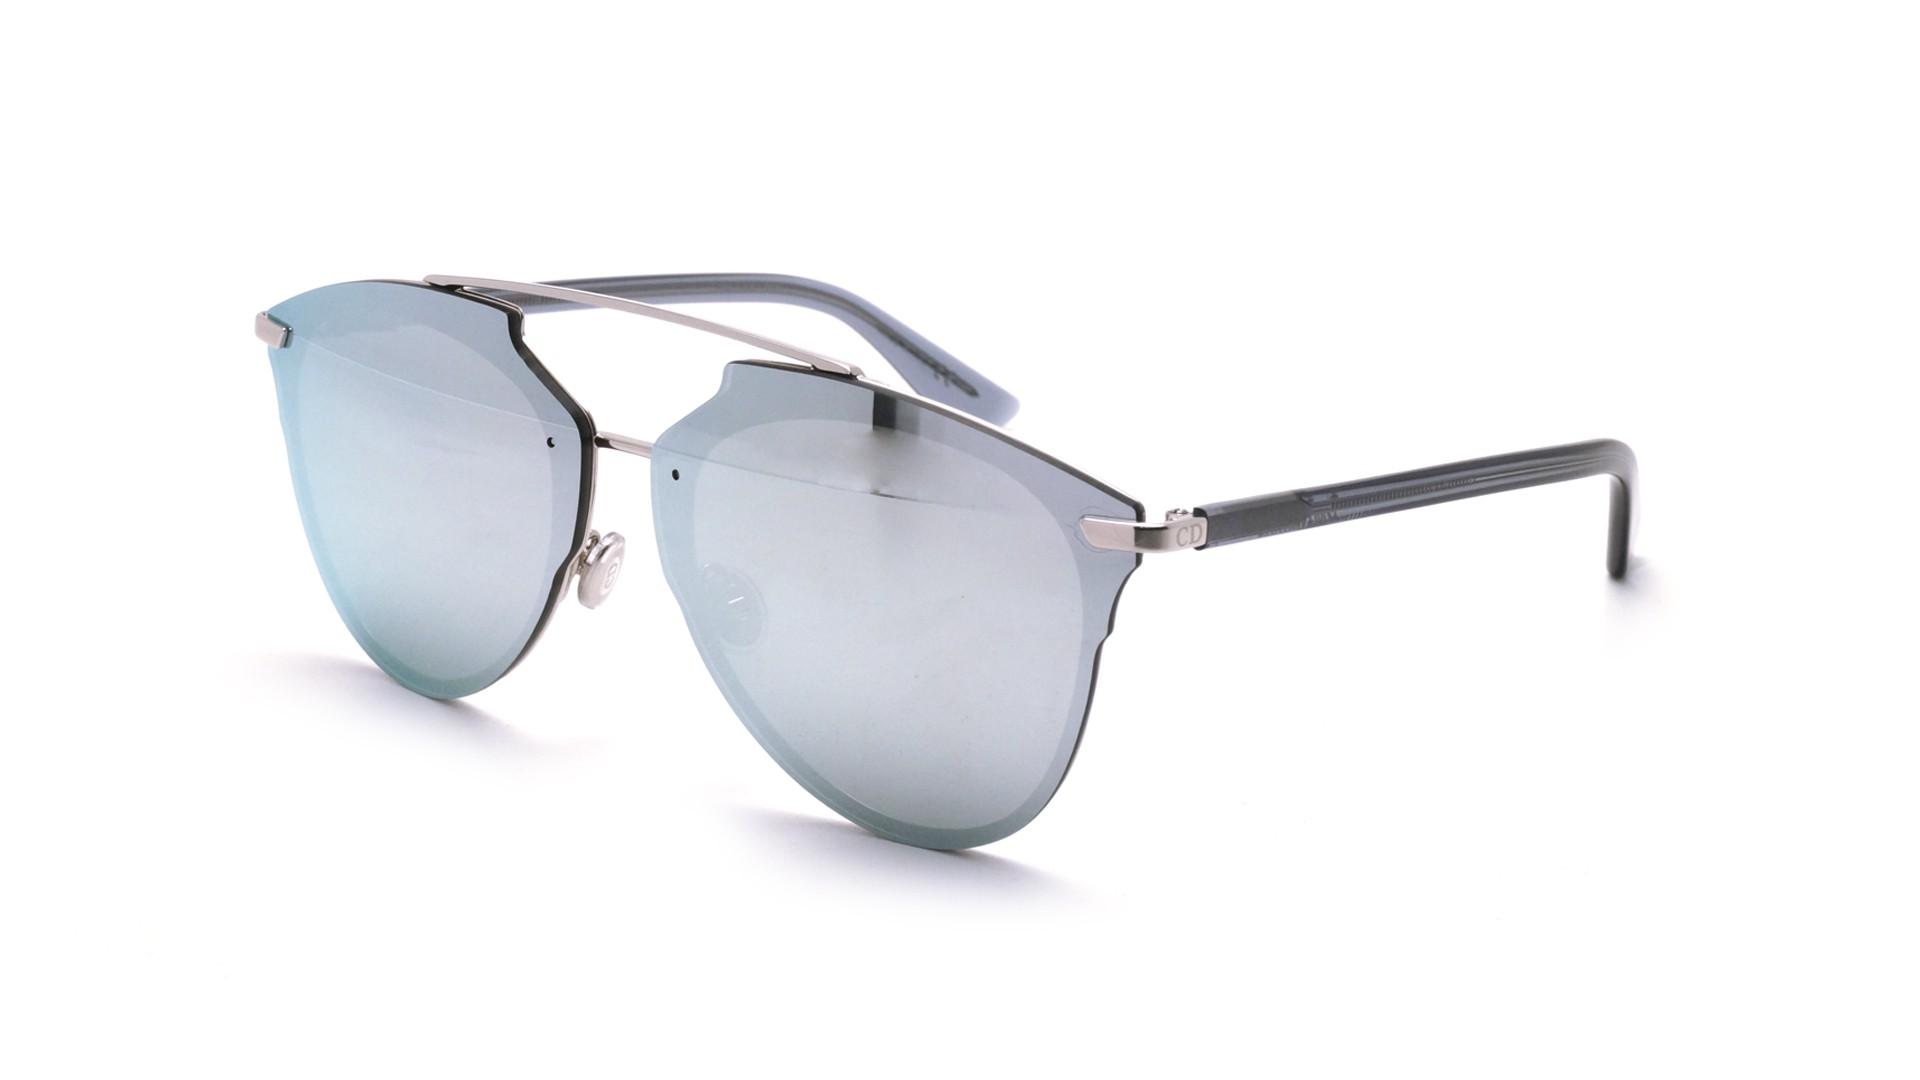 Dior Reflected Prisme Silver Reflectedprisme S60rl 63 11